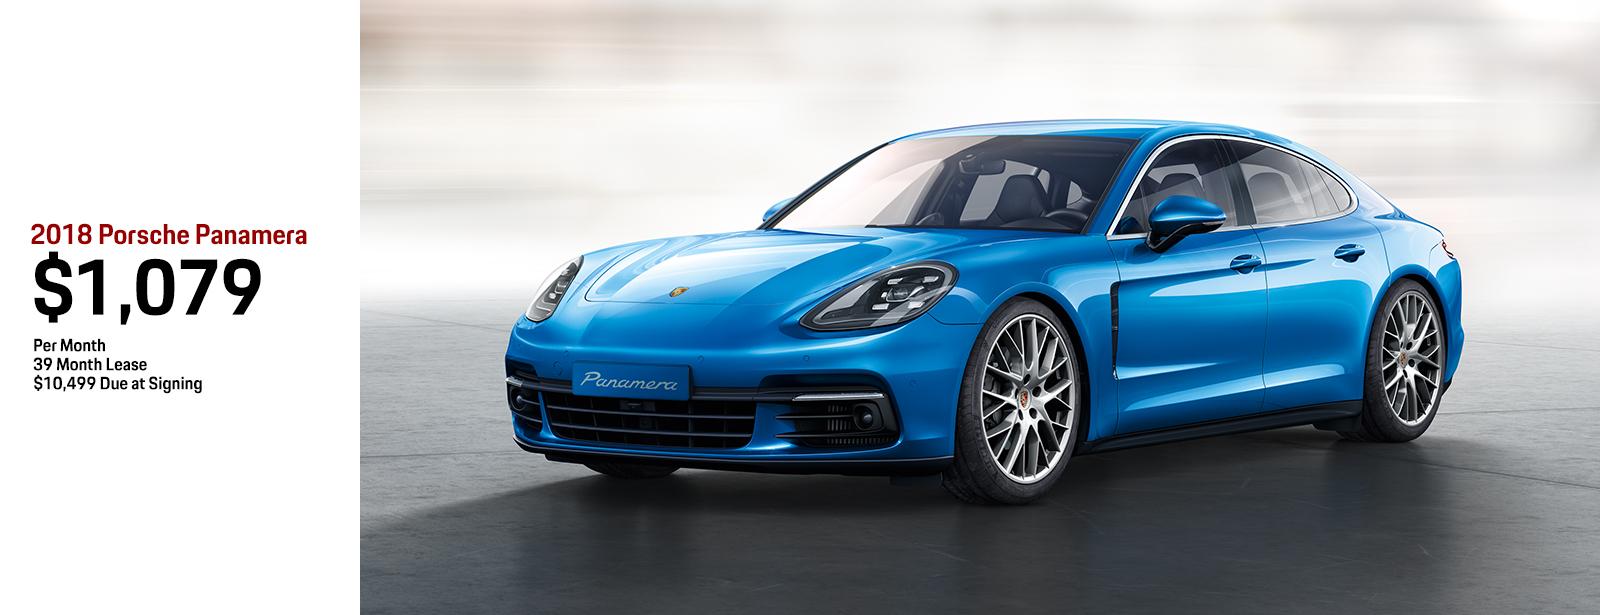 2018 Porsche Panamera Lease Special in Chandler, AZ